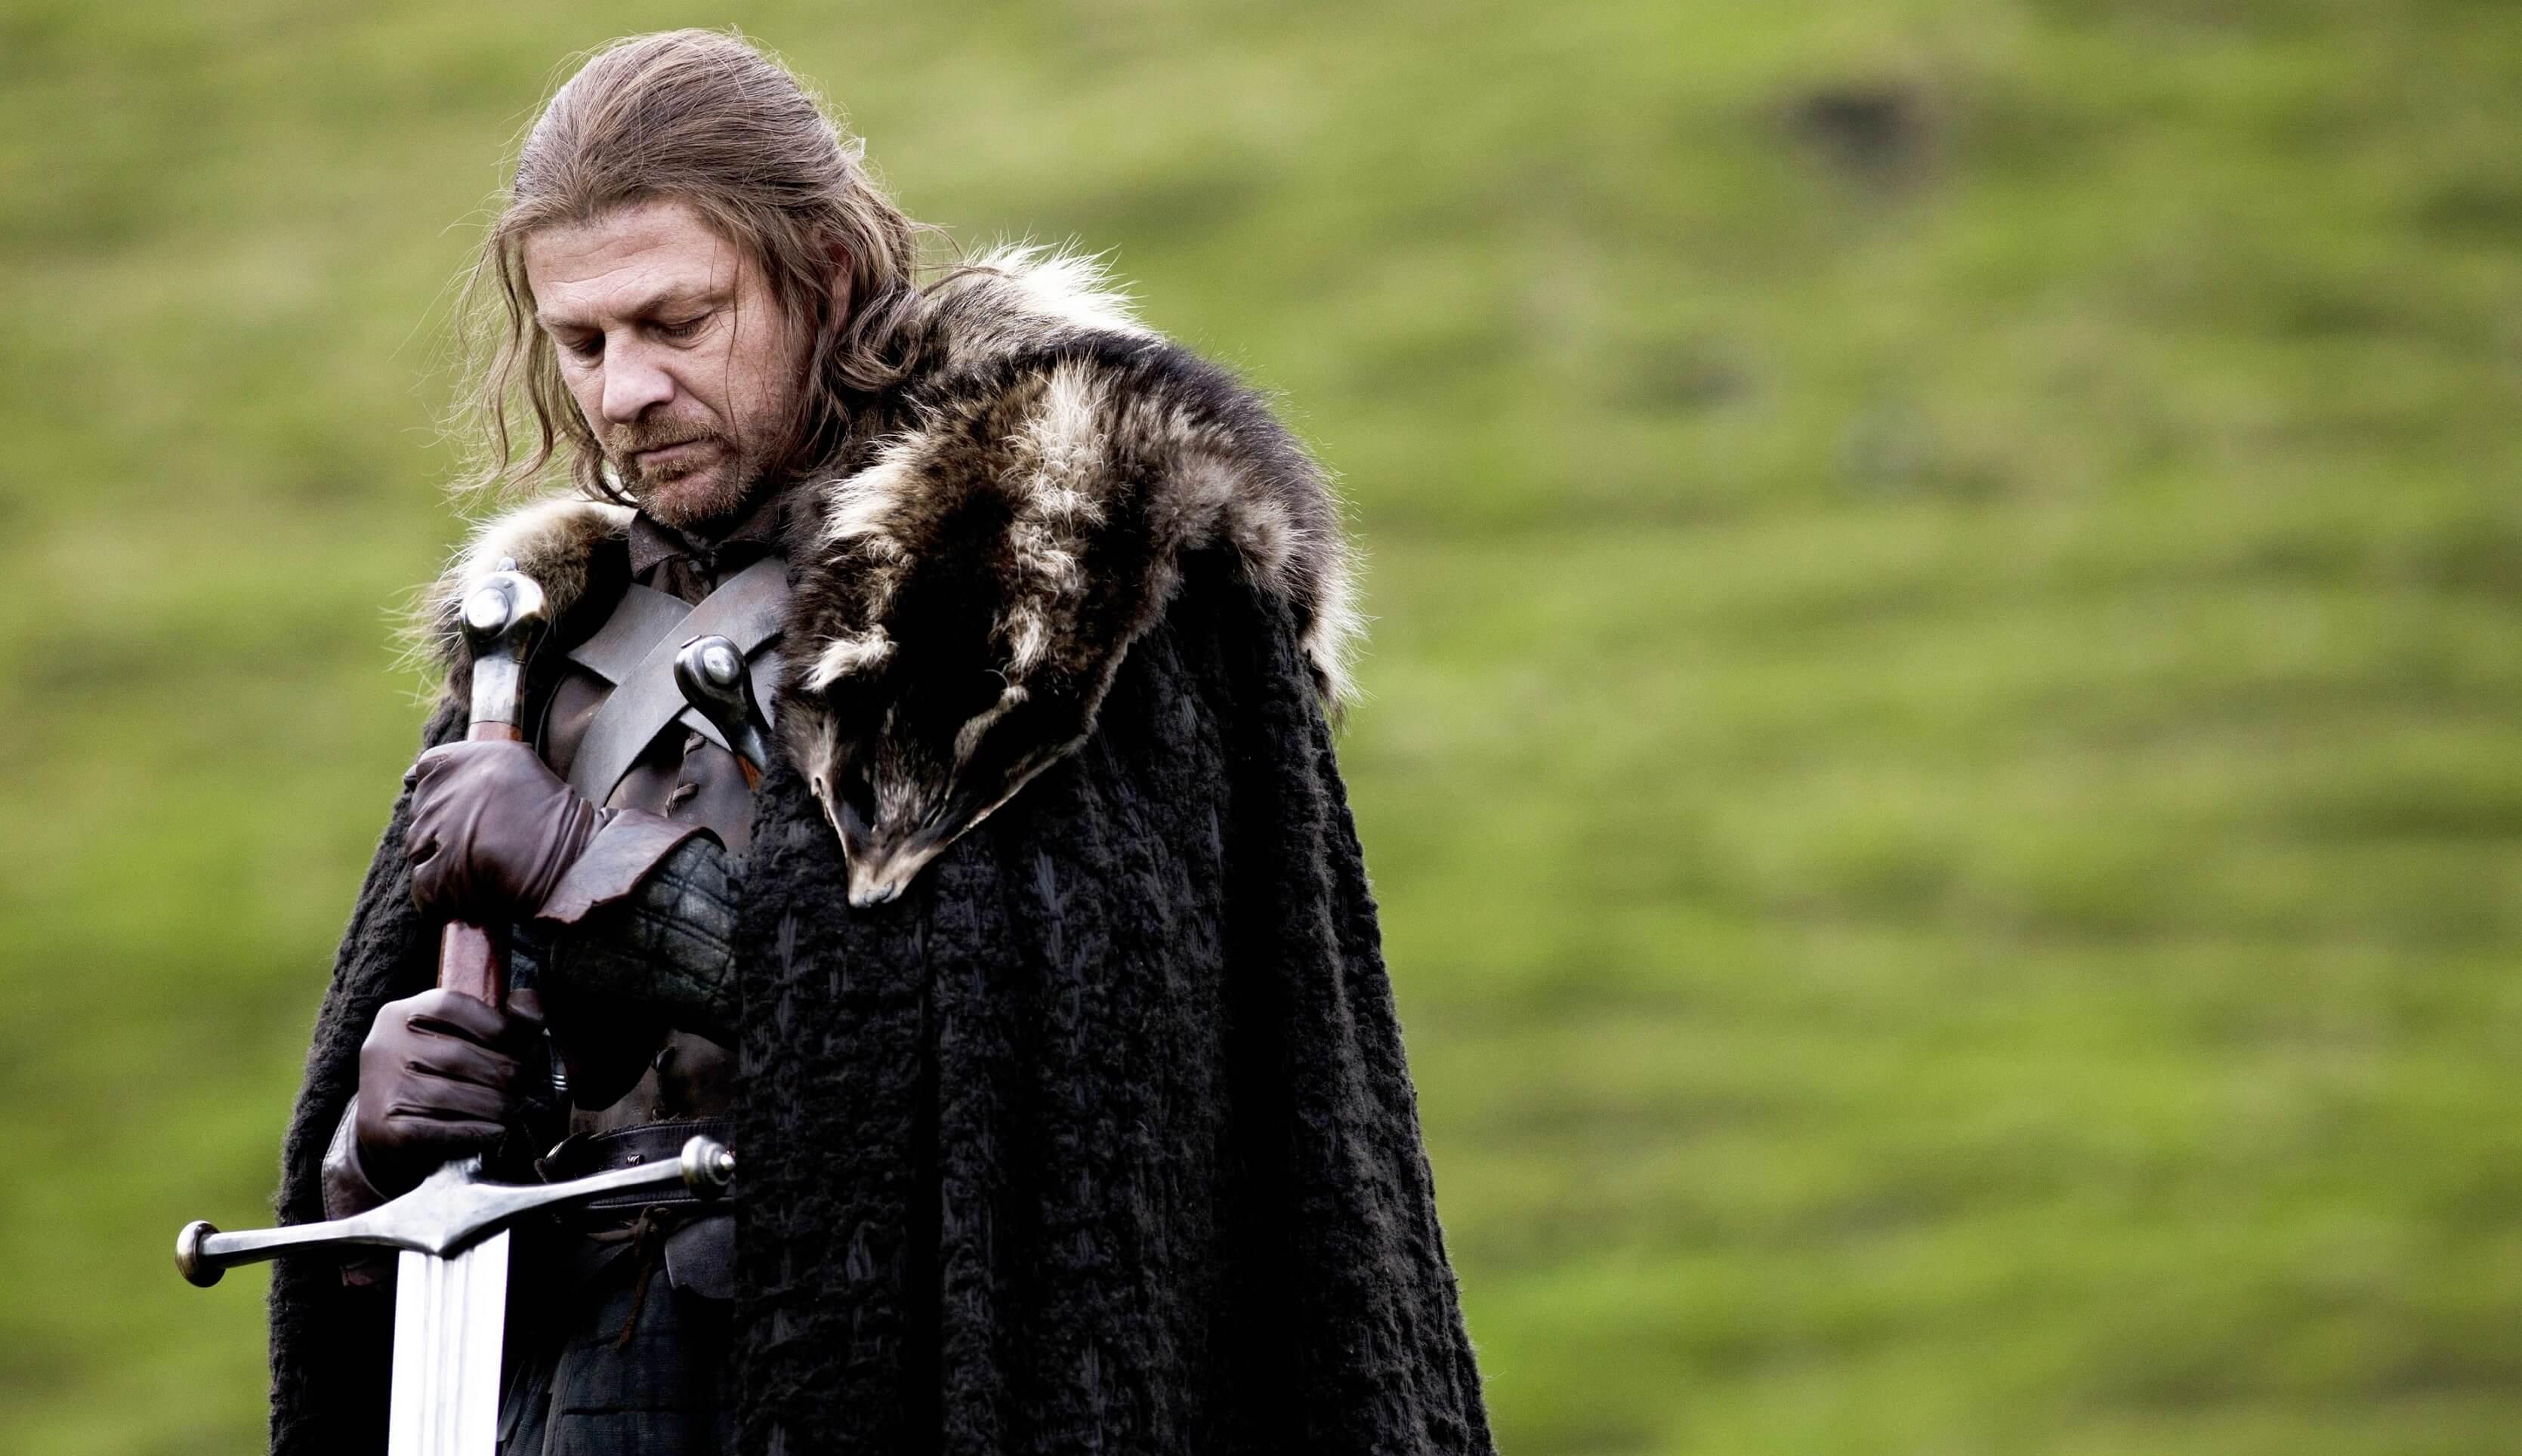 Fin de tournage pour la série Game of Thrones !